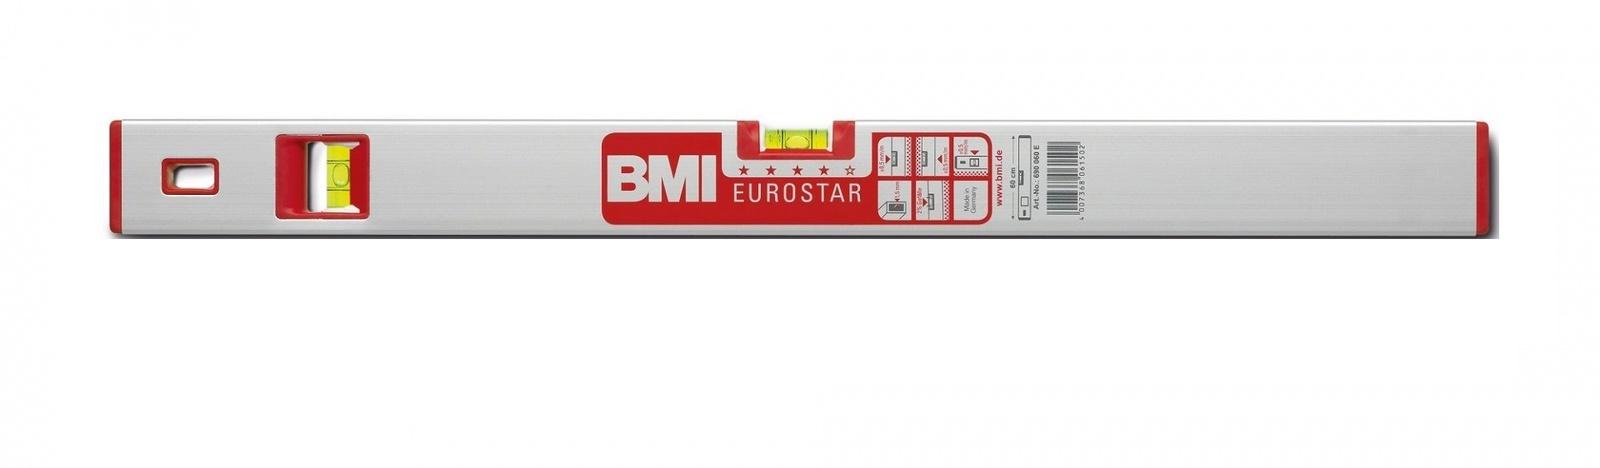 Уровень противоударный EUROSTAR 400 мм угол 2град. BMI 690040E